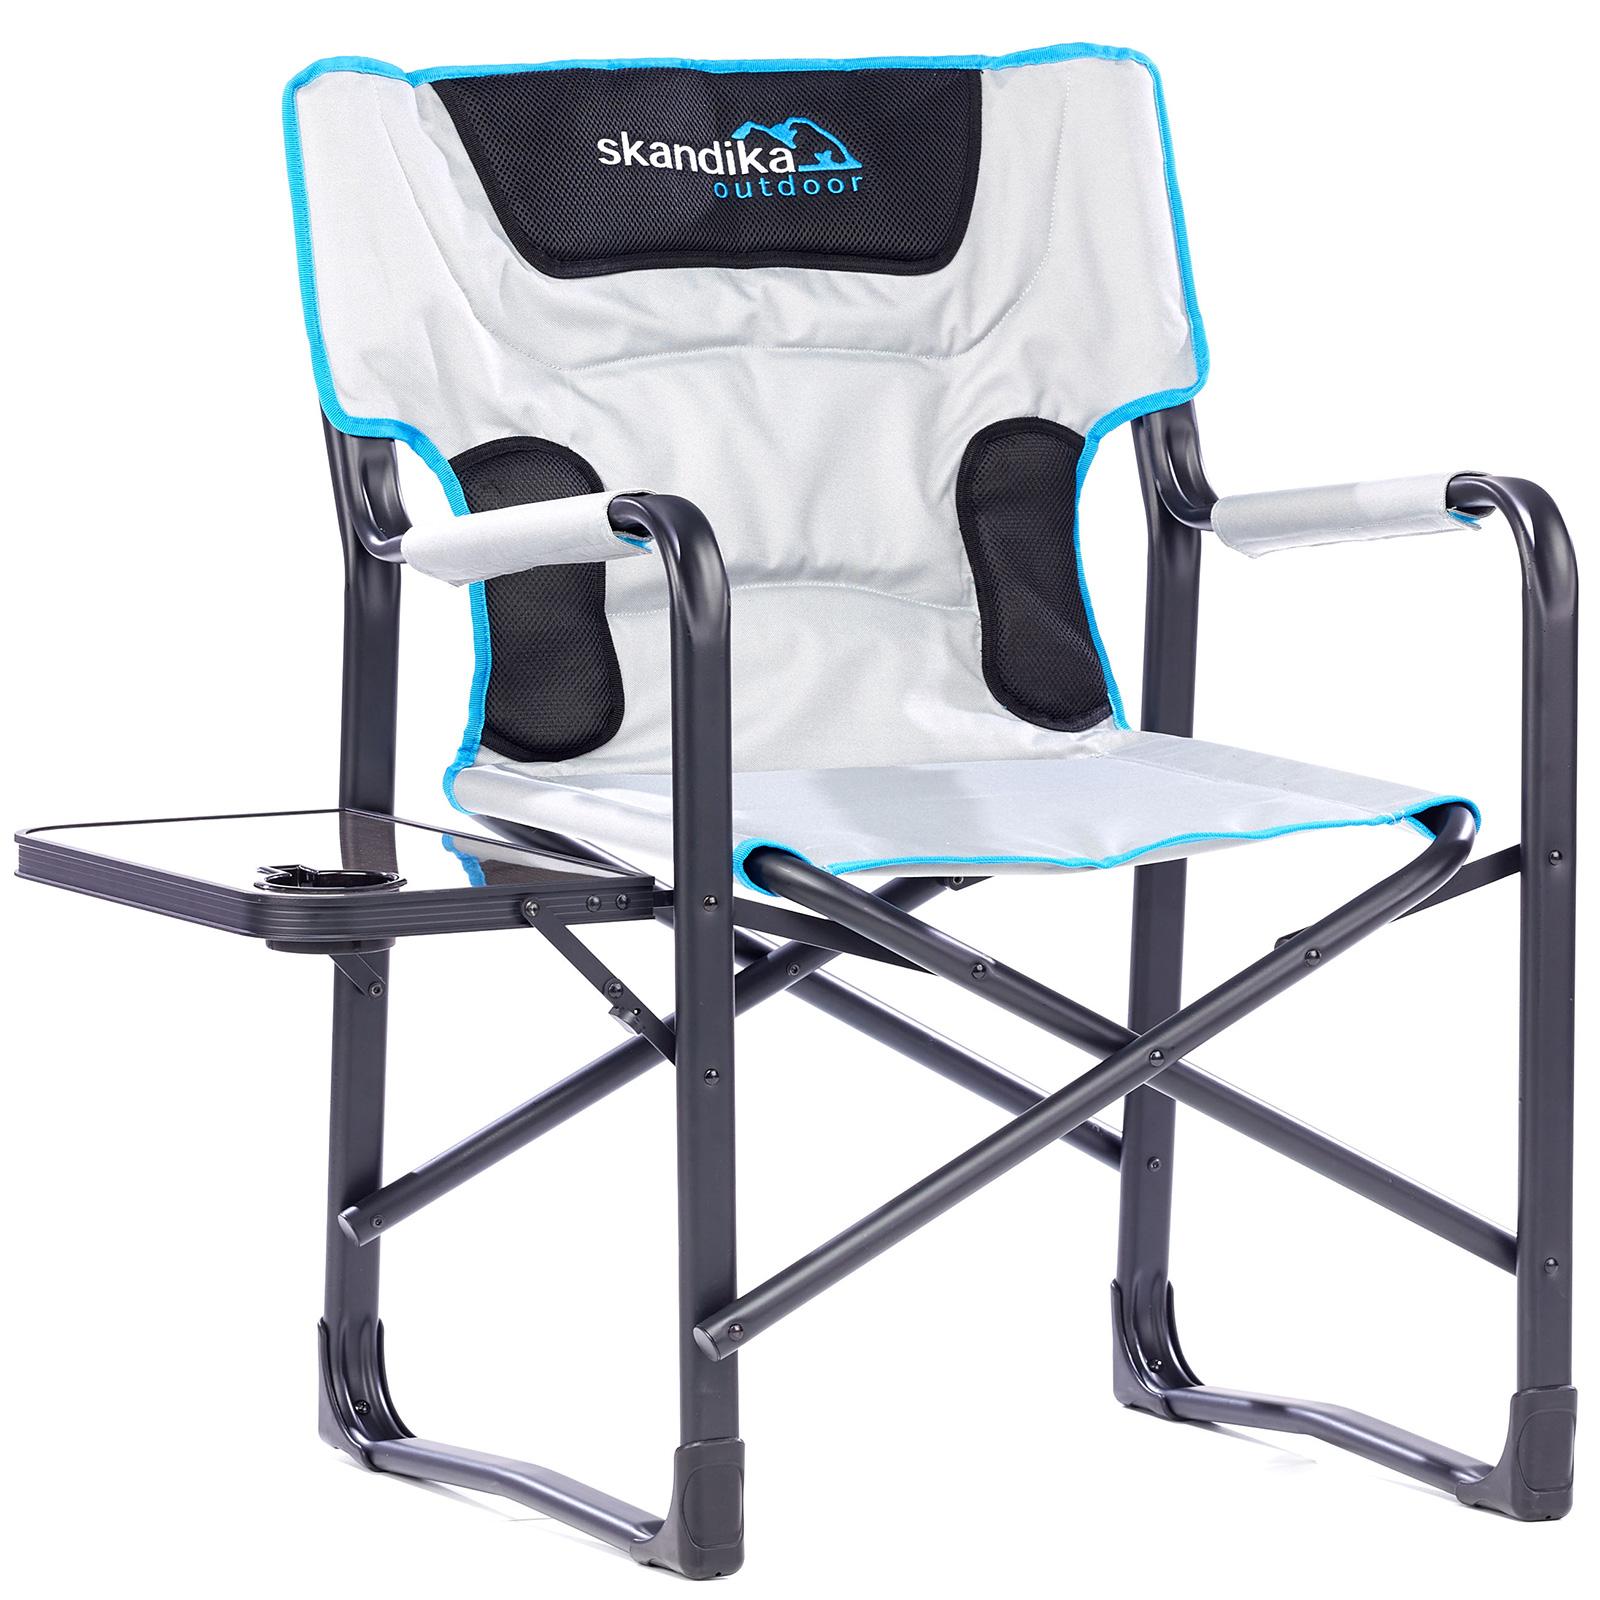 campingstuhl campingm bel camping max trader gmbh. Black Bedroom Furniture Sets. Home Design Ideas